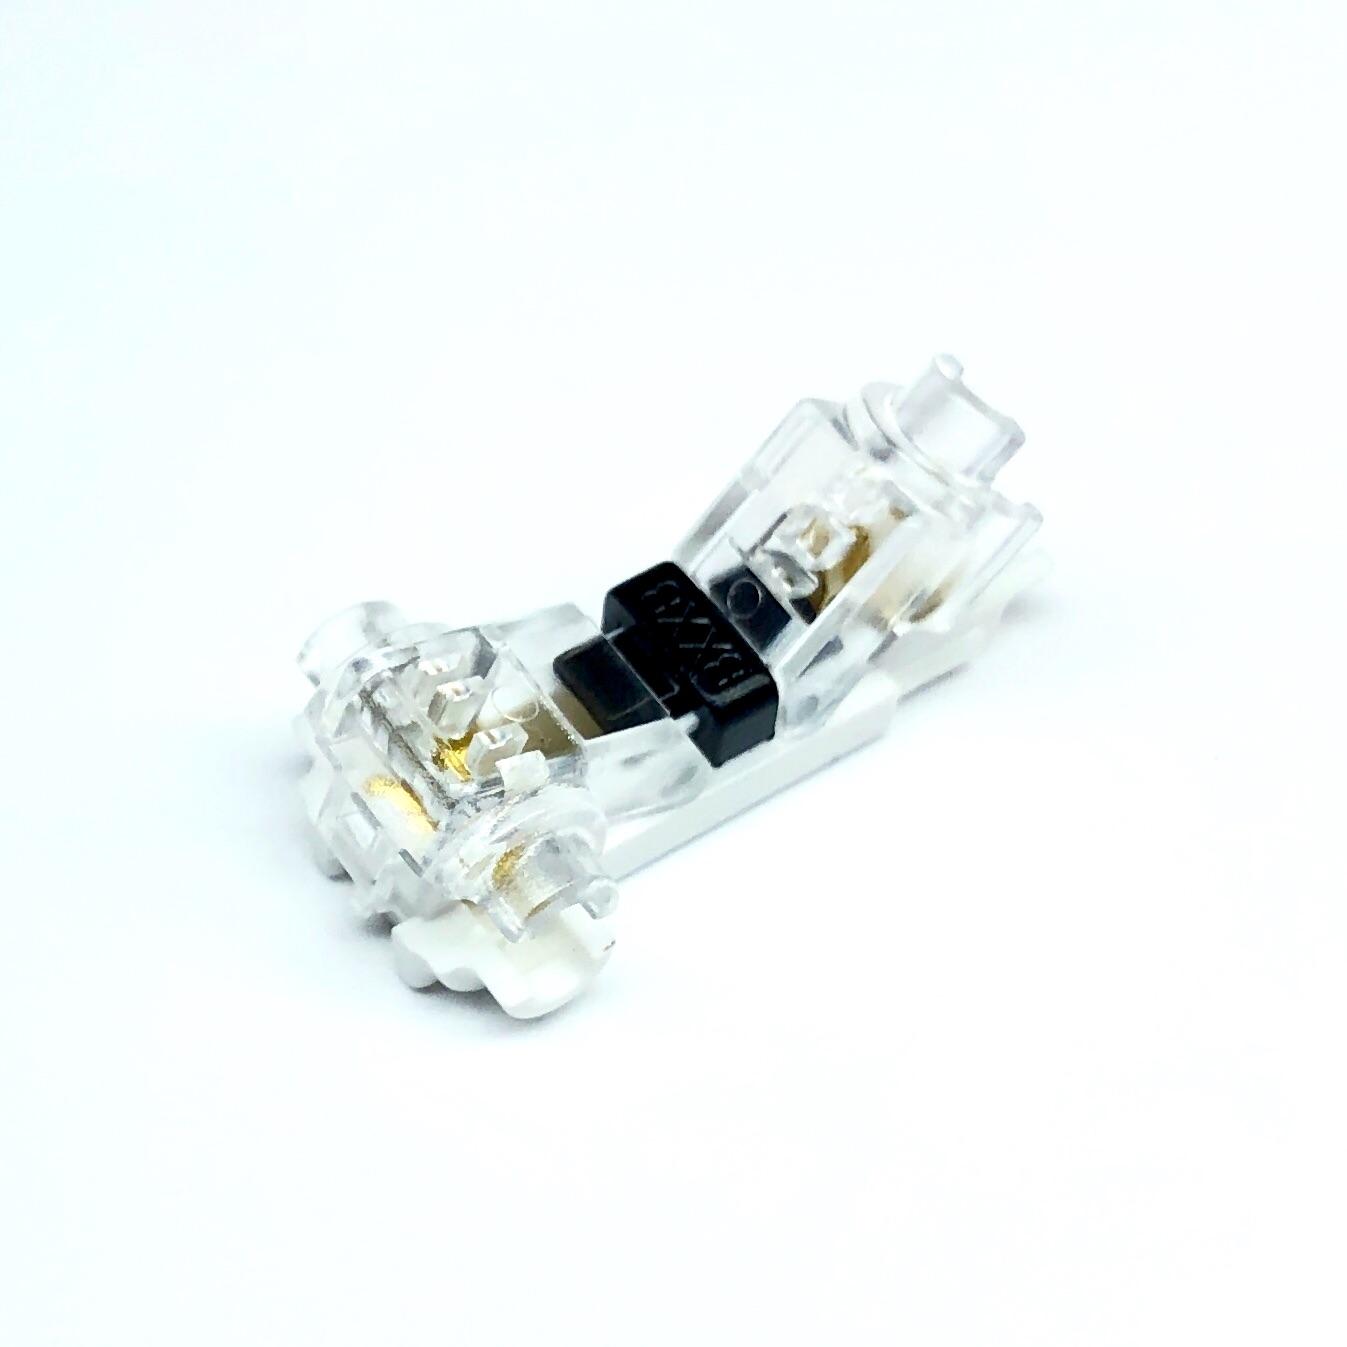 Reusable Scotchlok quick splice connectors H1x6 T1x4